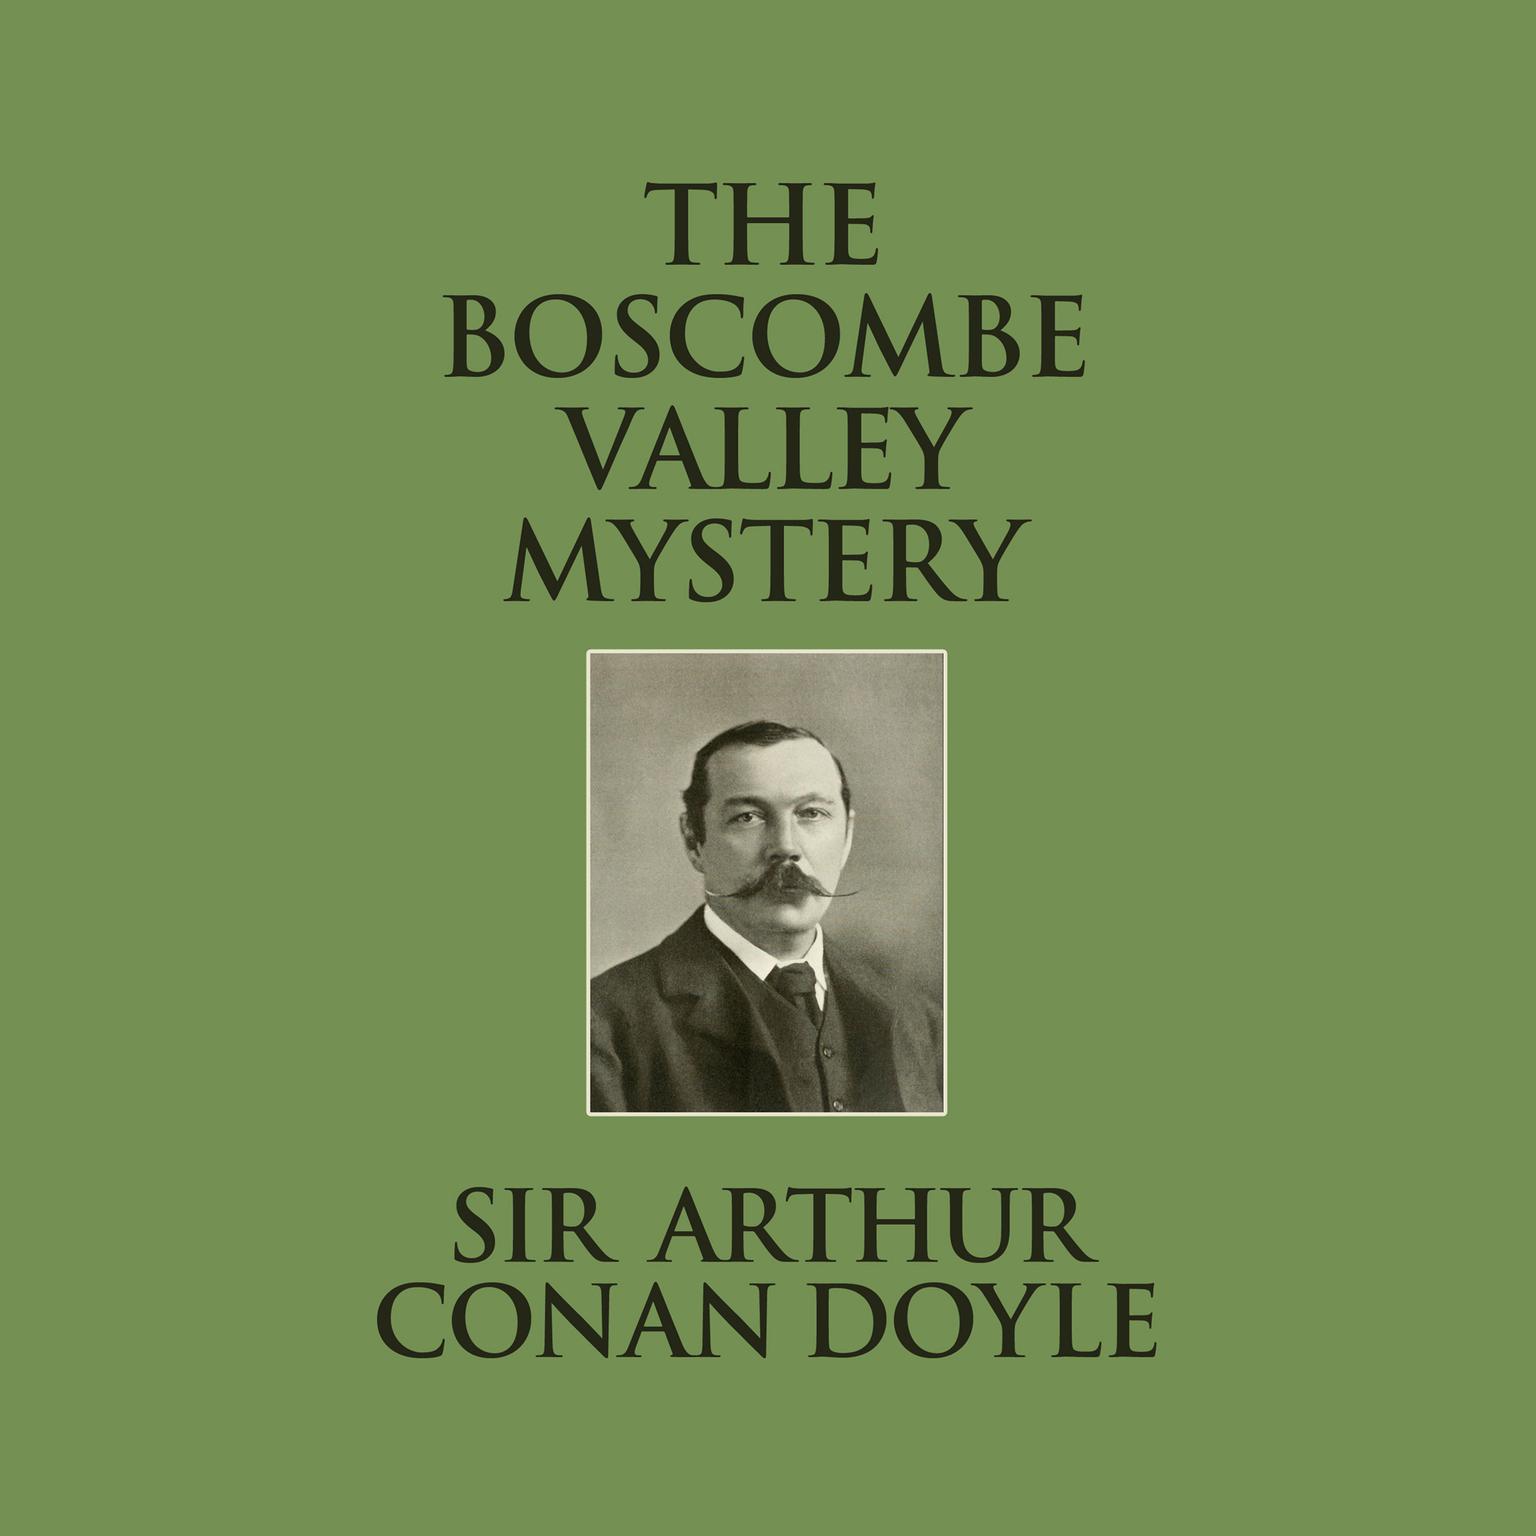 The Boscombe Valley Mystery Audiobook, by Arthur Conan Doyle